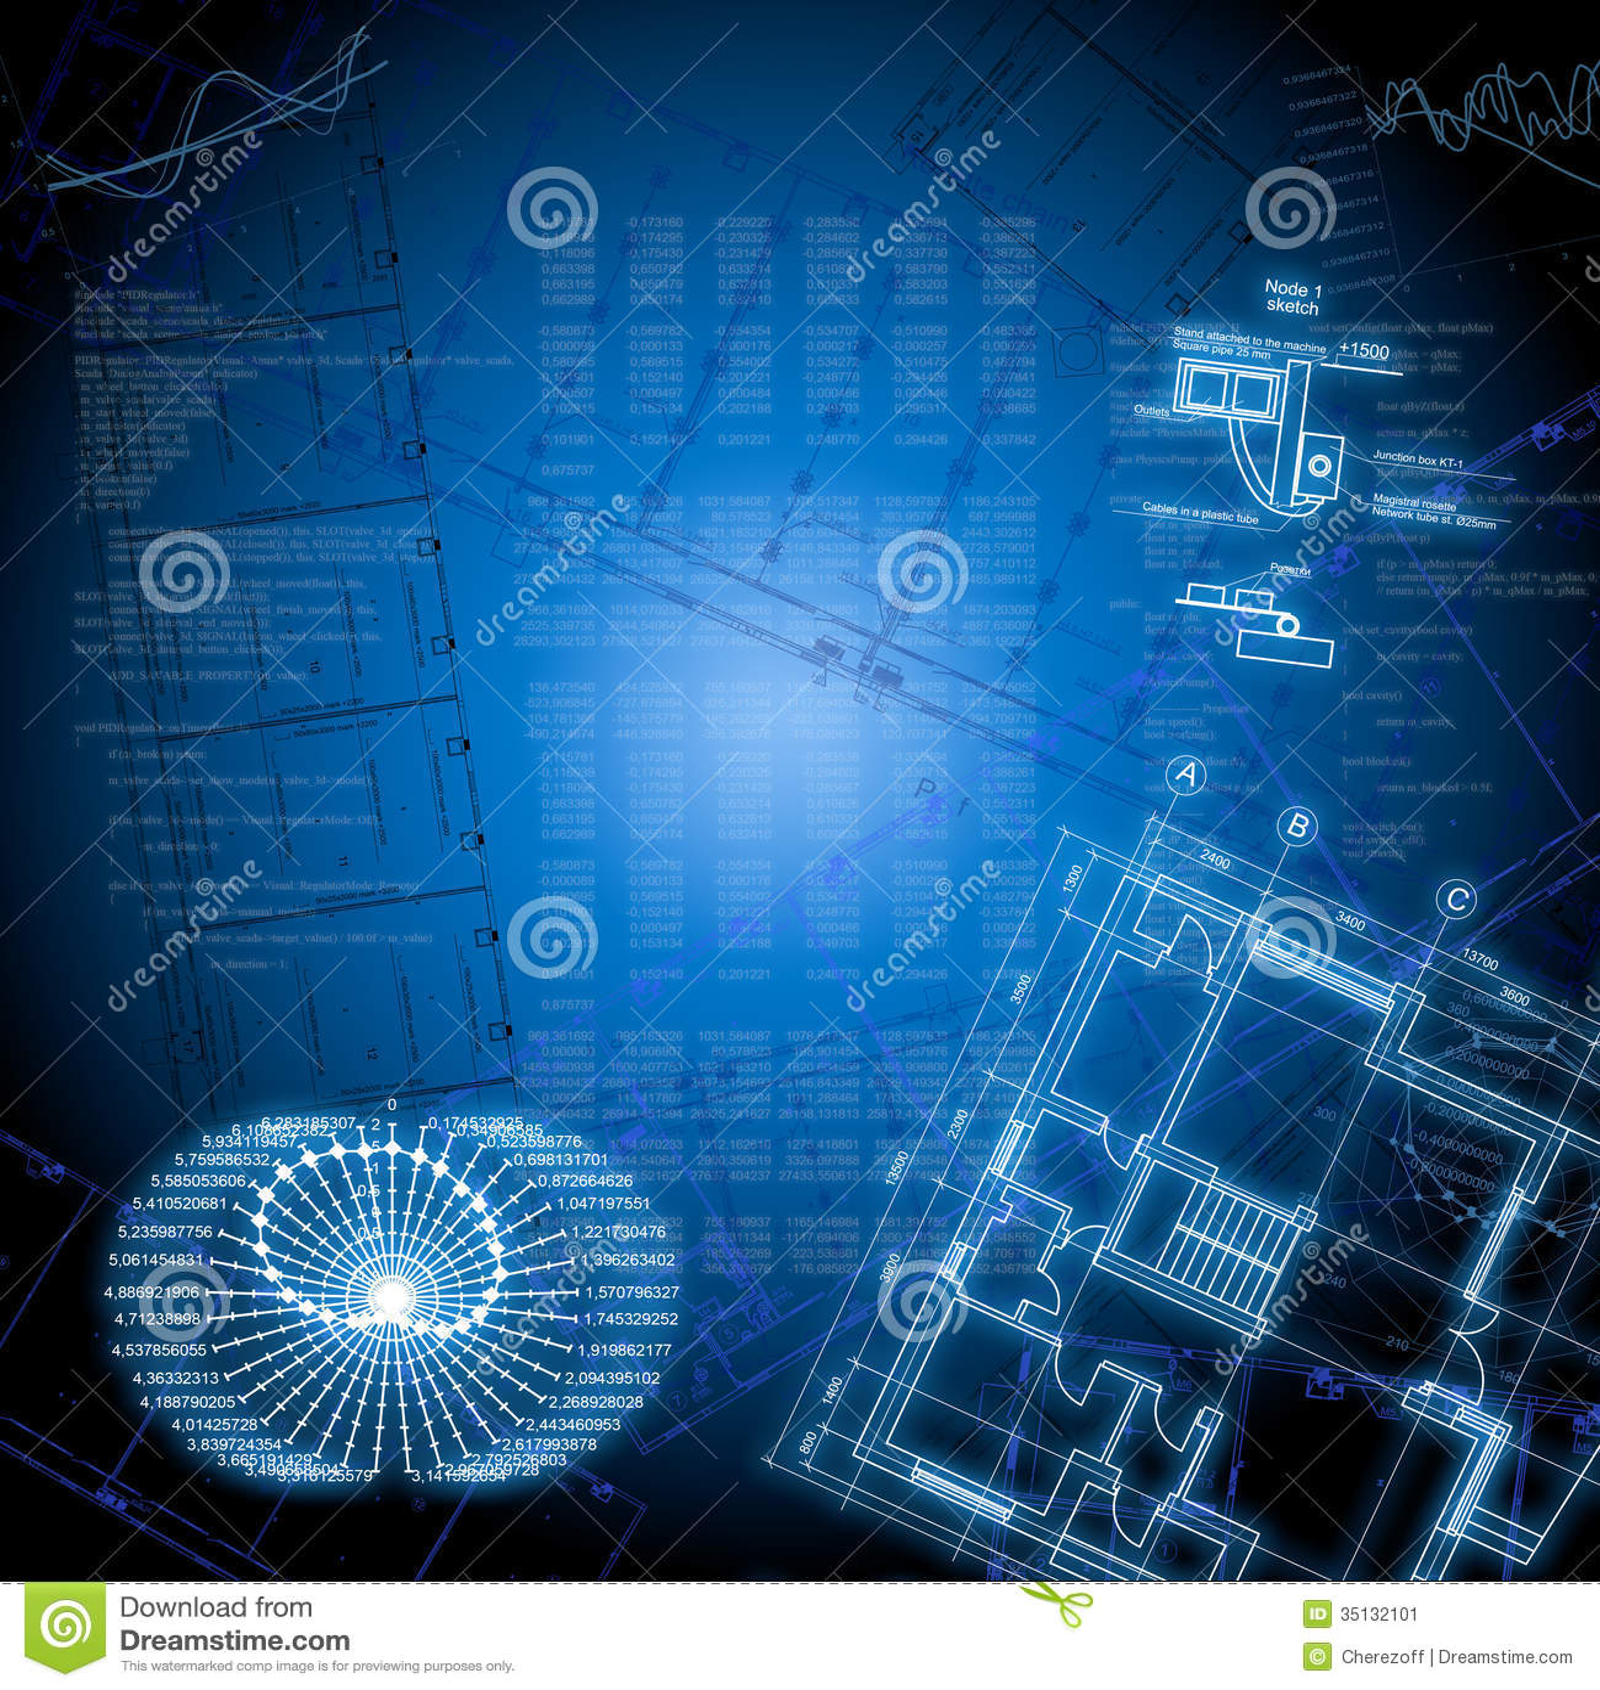 tech graphics technology drawings concept grafiken teche zeichnungen tekeningen grafiek grafici tecnologia disegni alta haupt auszug estratto grafisch concentratie innovazione